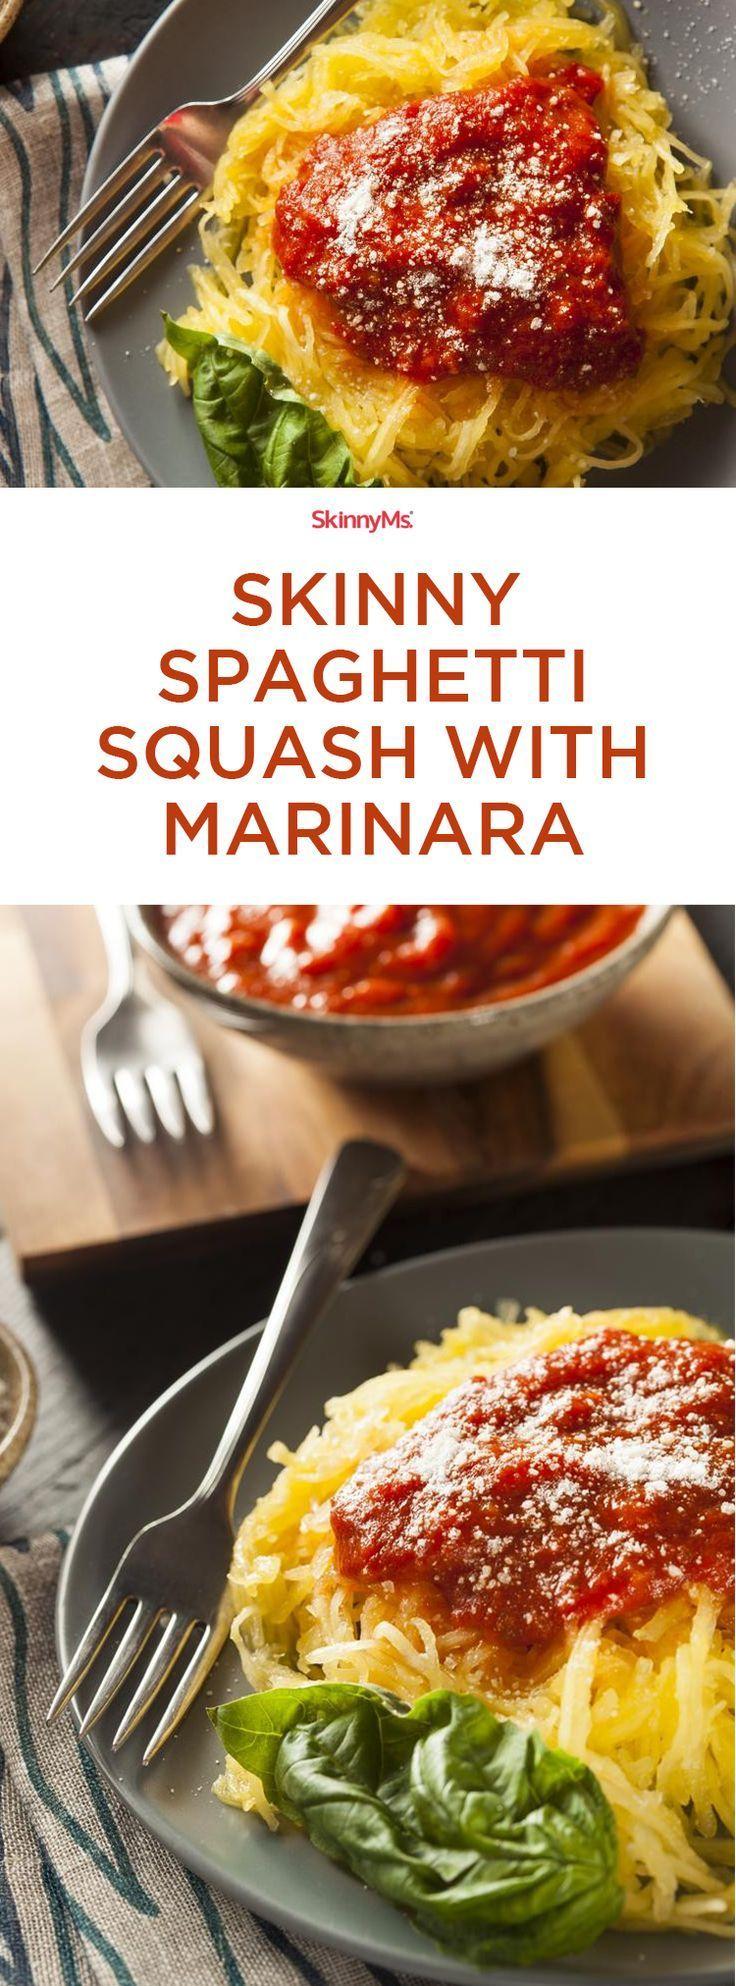 Skinny Spaghetti Squash with Marinara. Sooo delicious!!